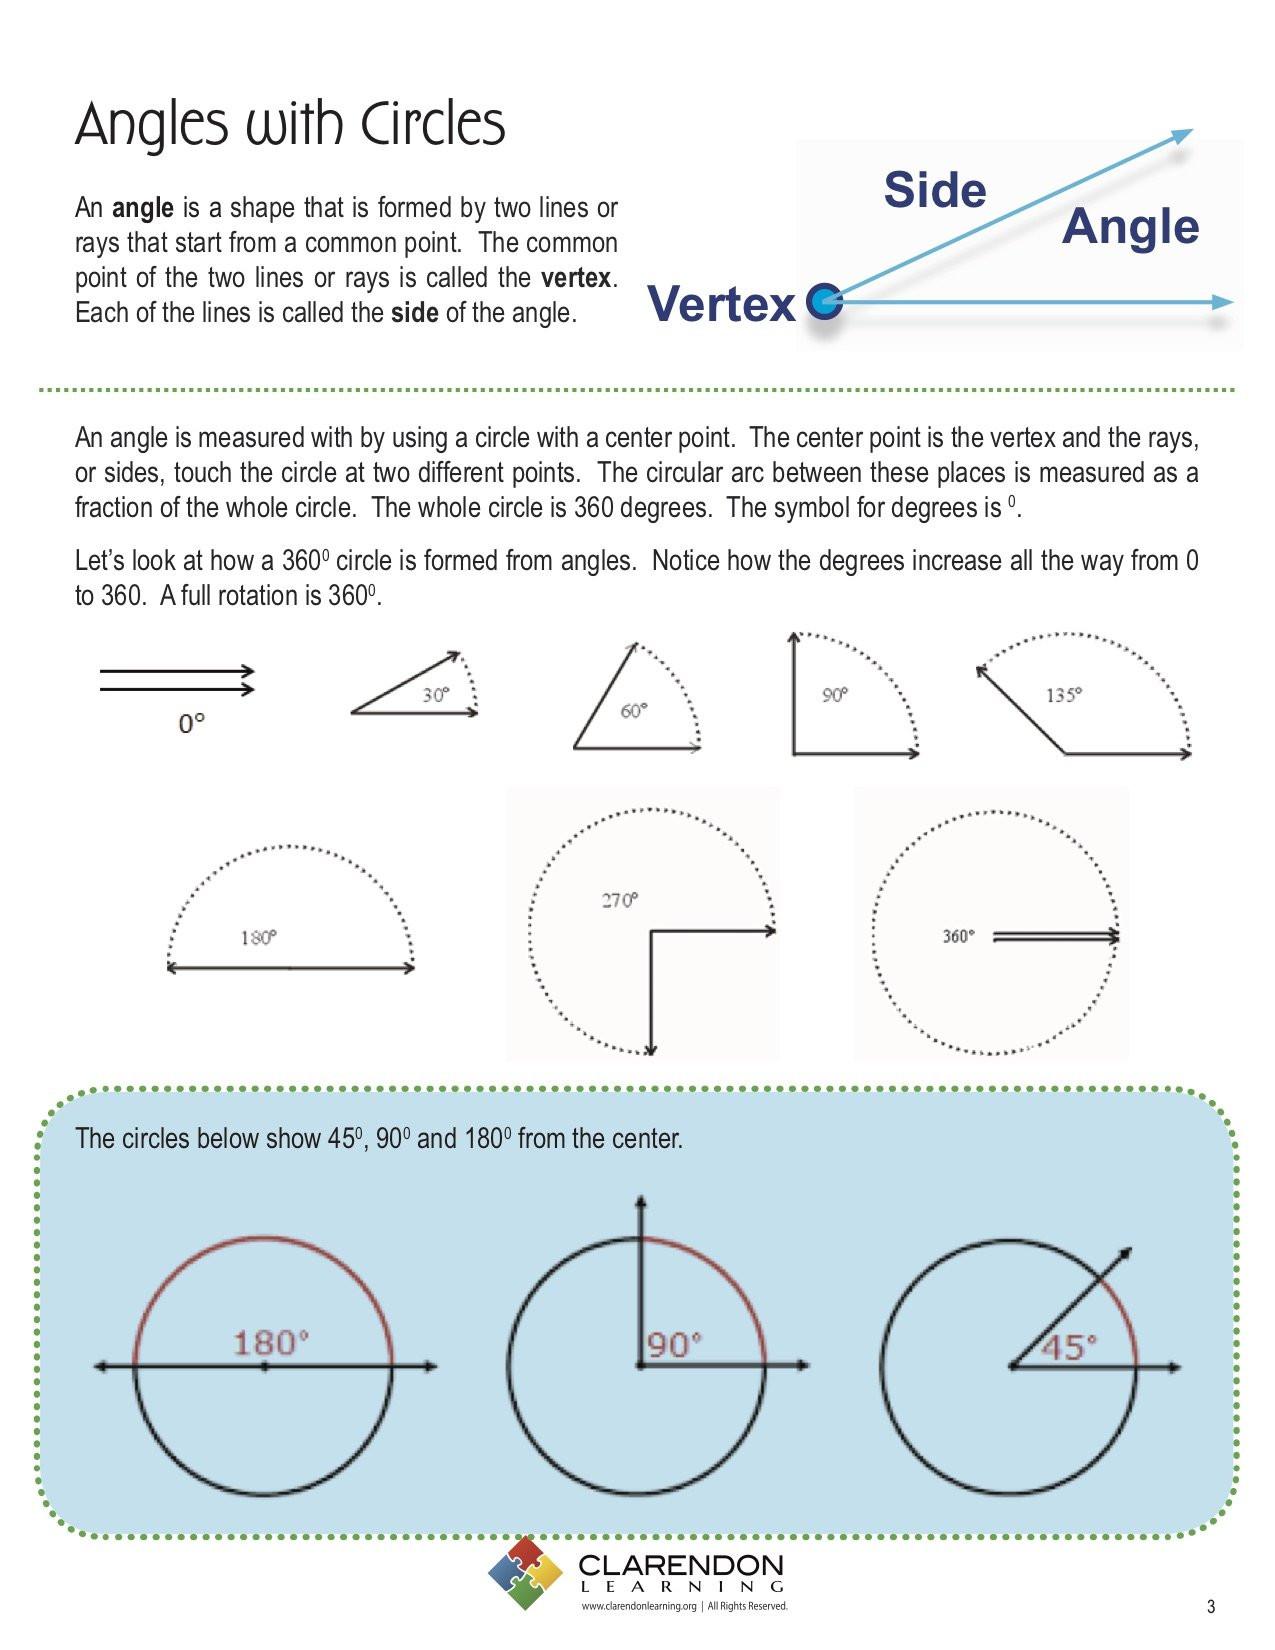 Angles In Circles Worksheet Angles with Circles